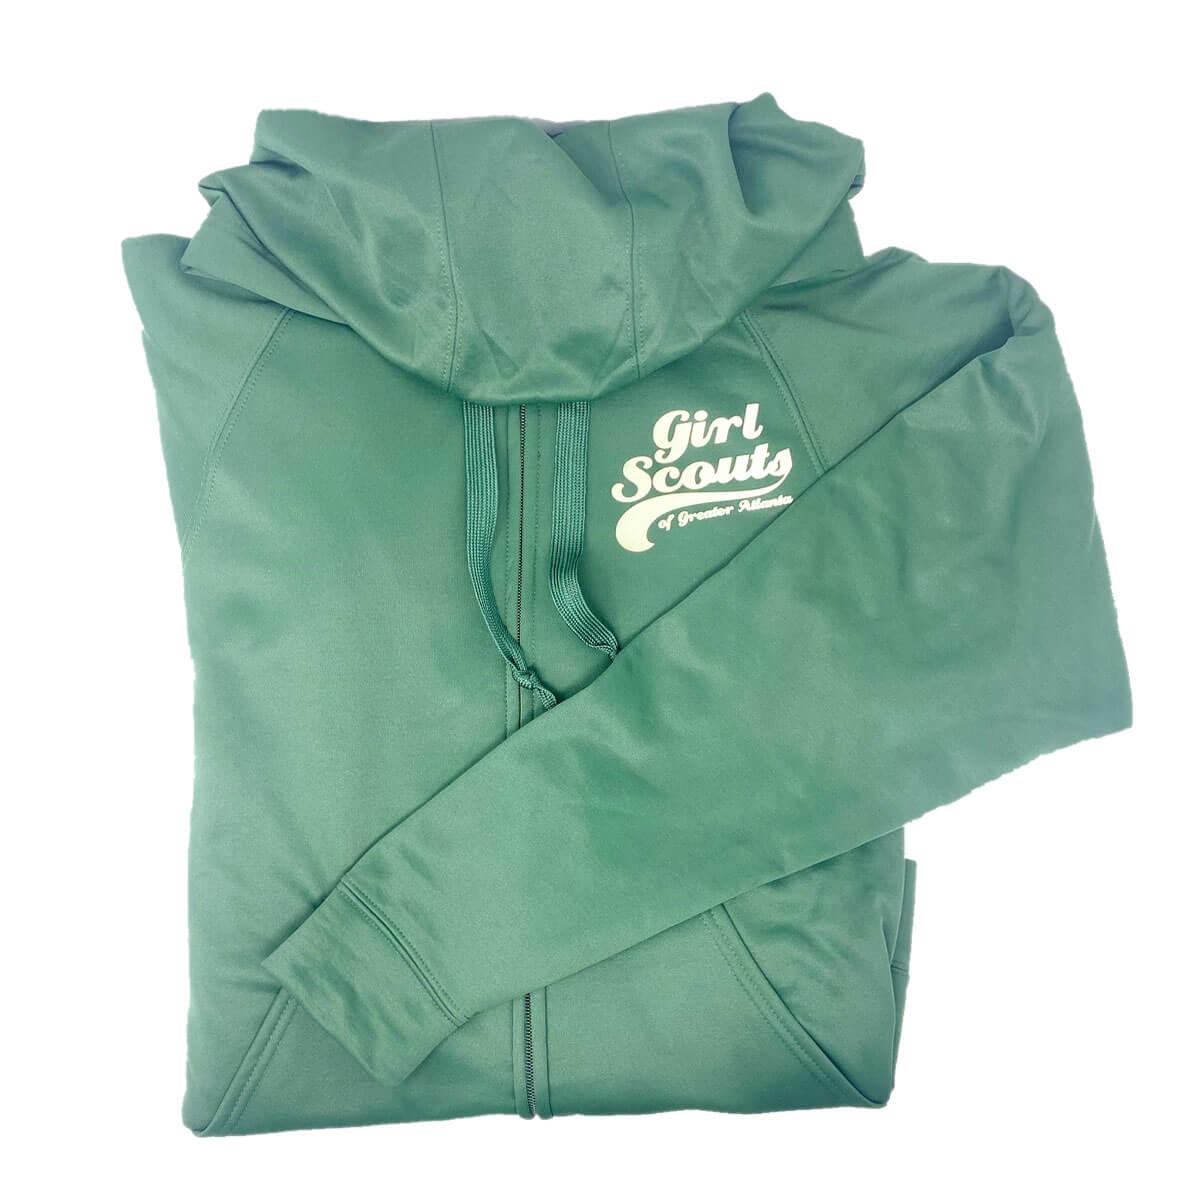 GSGATL Green Hoodie